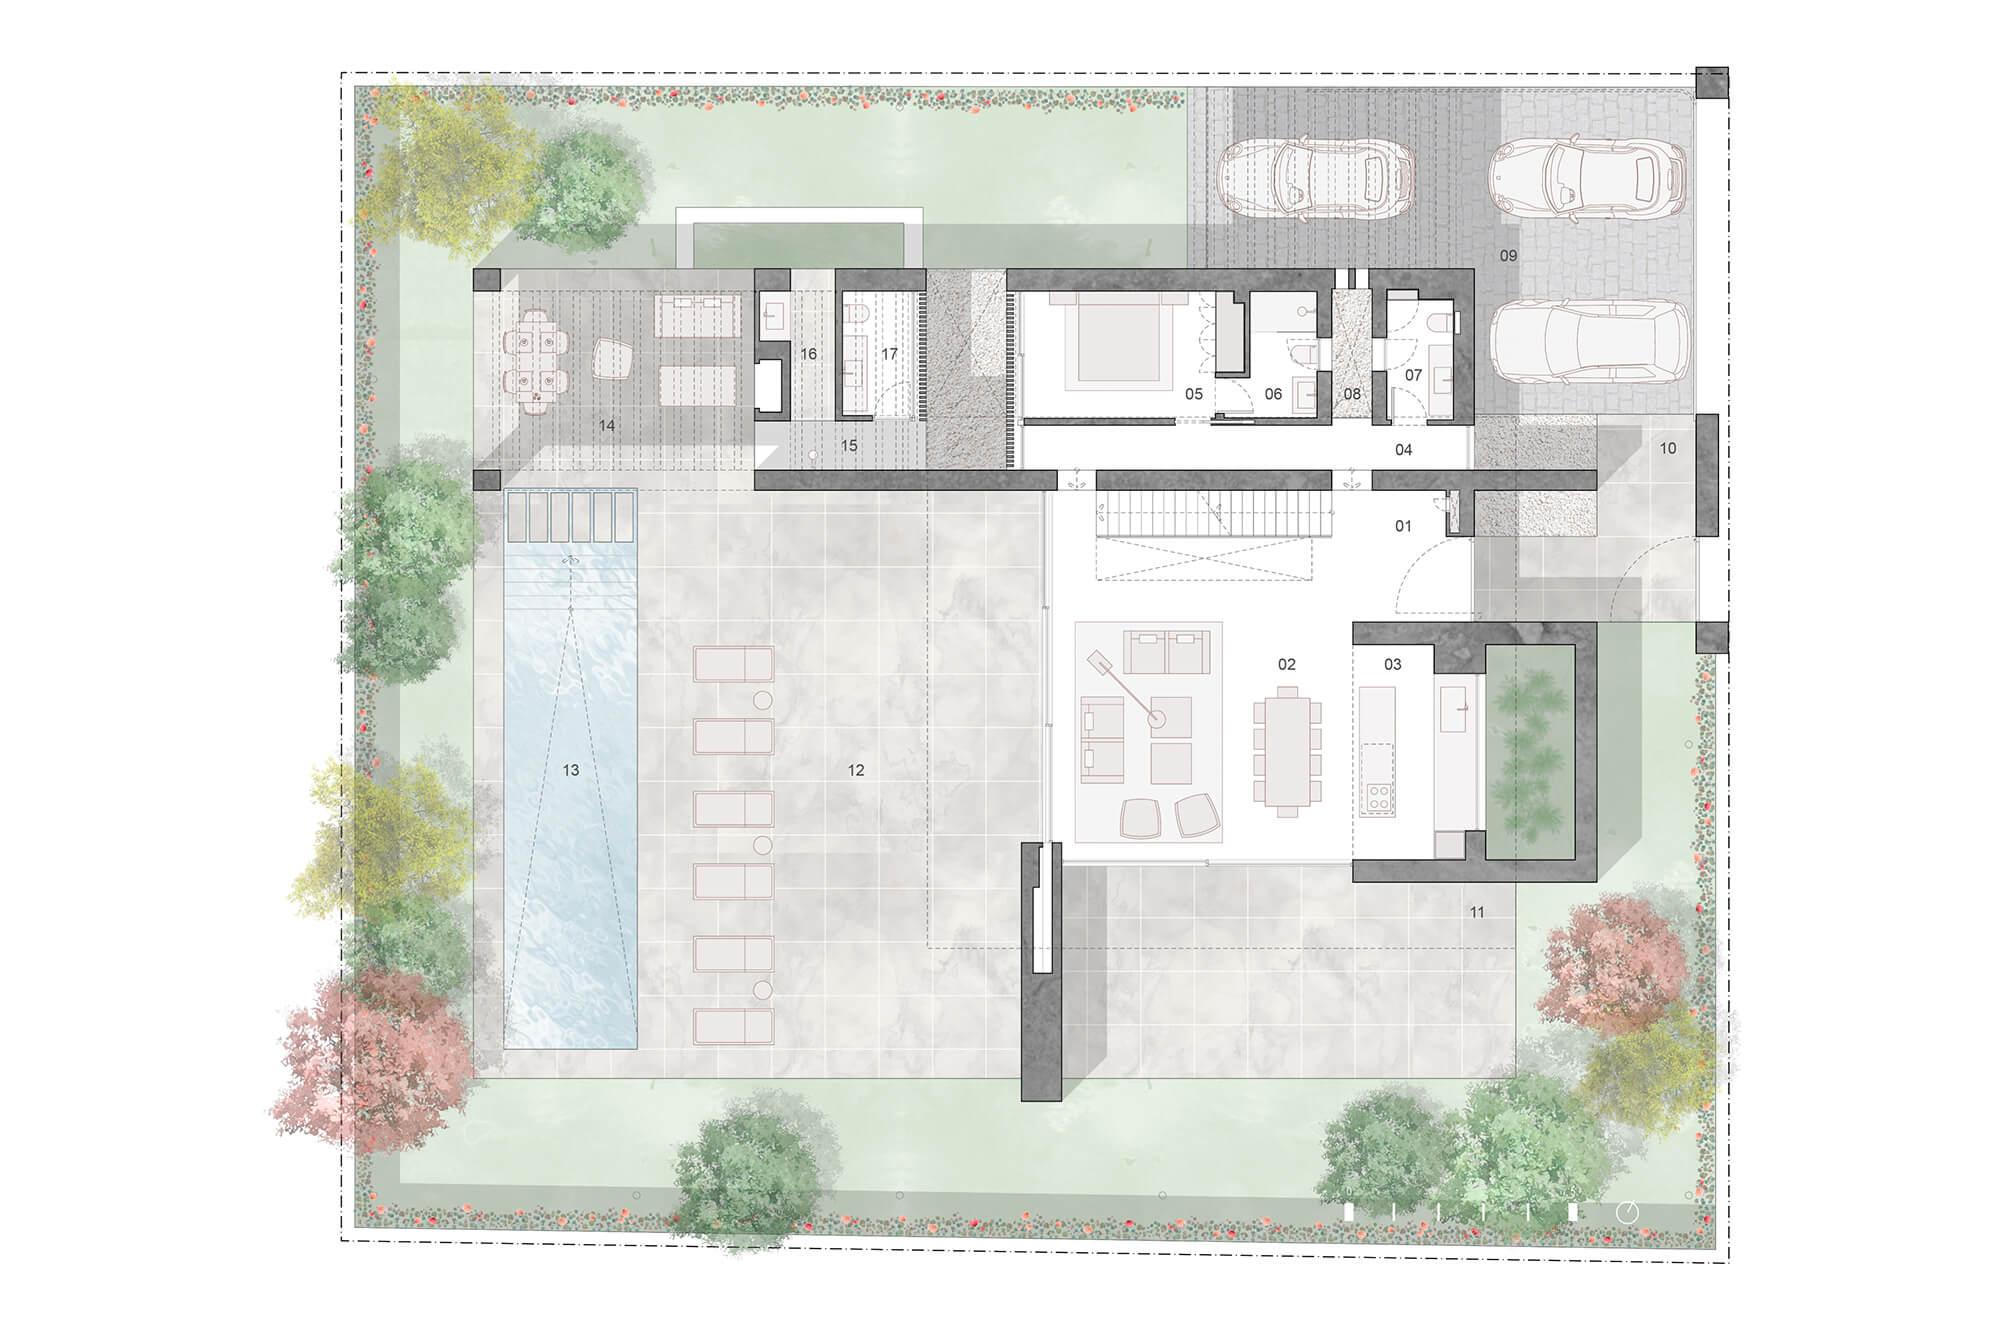 cortijo blanco beach villa vamoz te koop marbella costa del sol spanje nieuwbouw grondplan 1 gelijkvloers